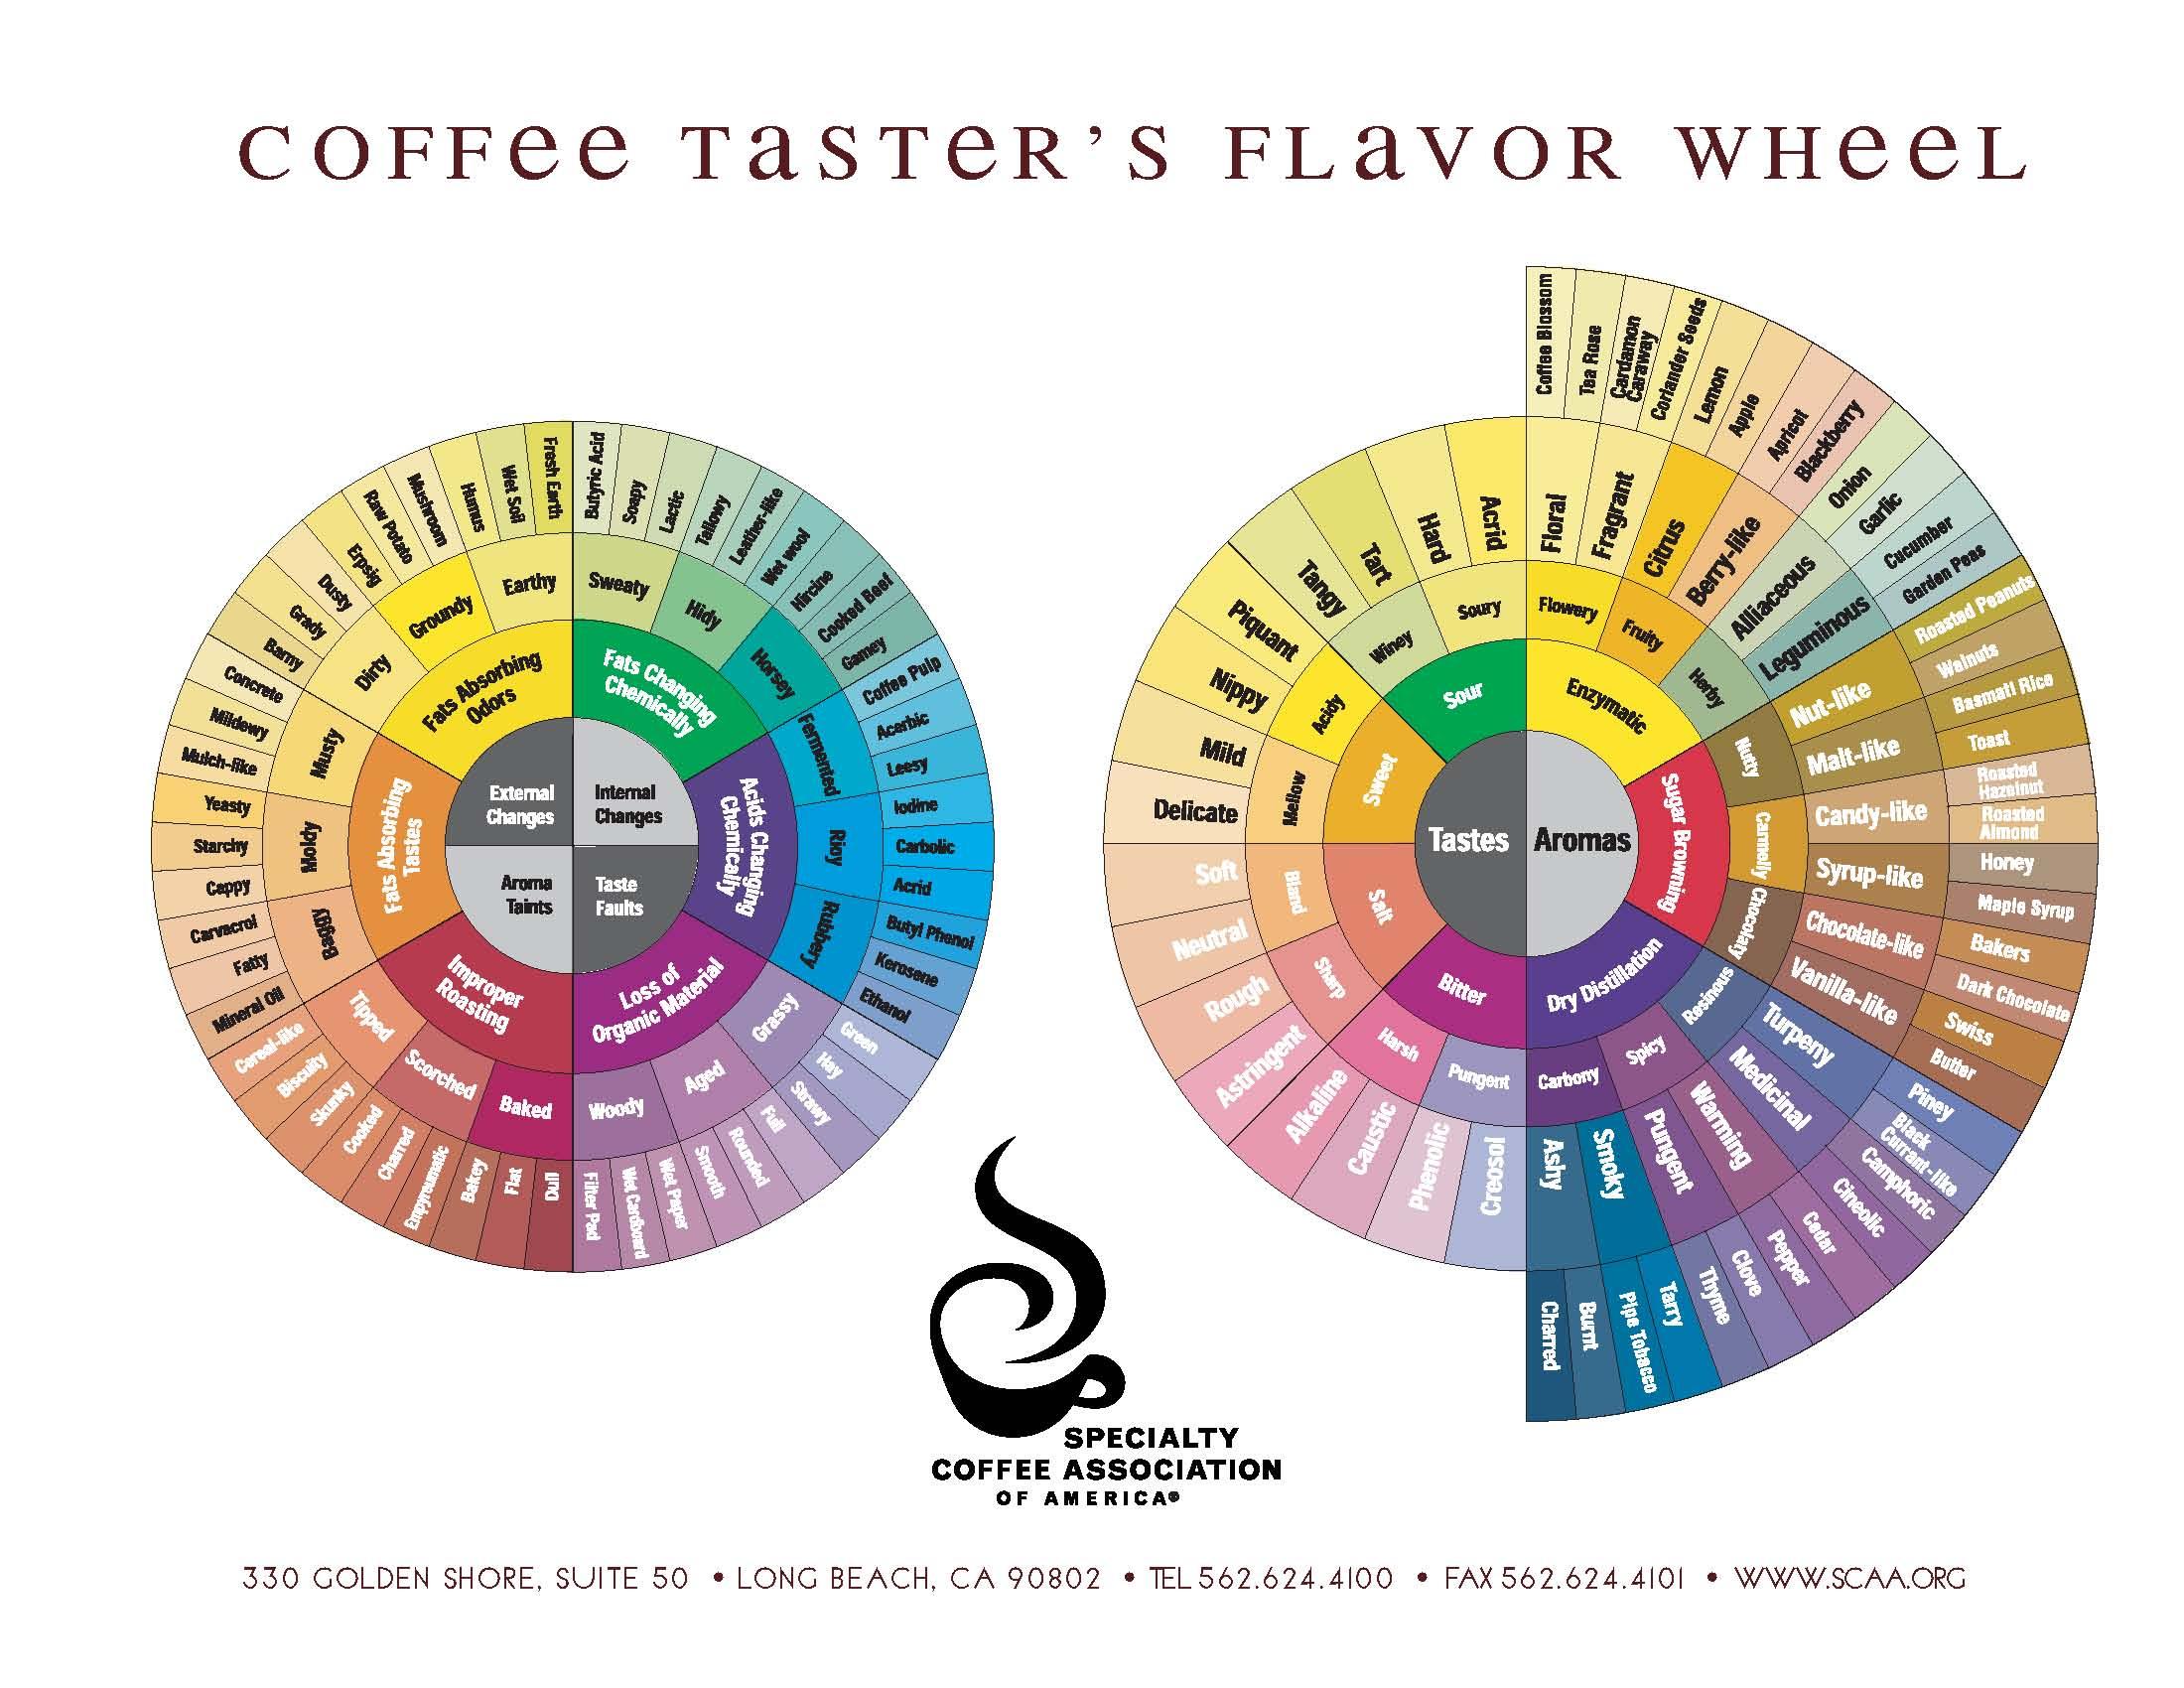 Disclaimer sada coffee coffee tasters flavour wheel ccuart Gallery